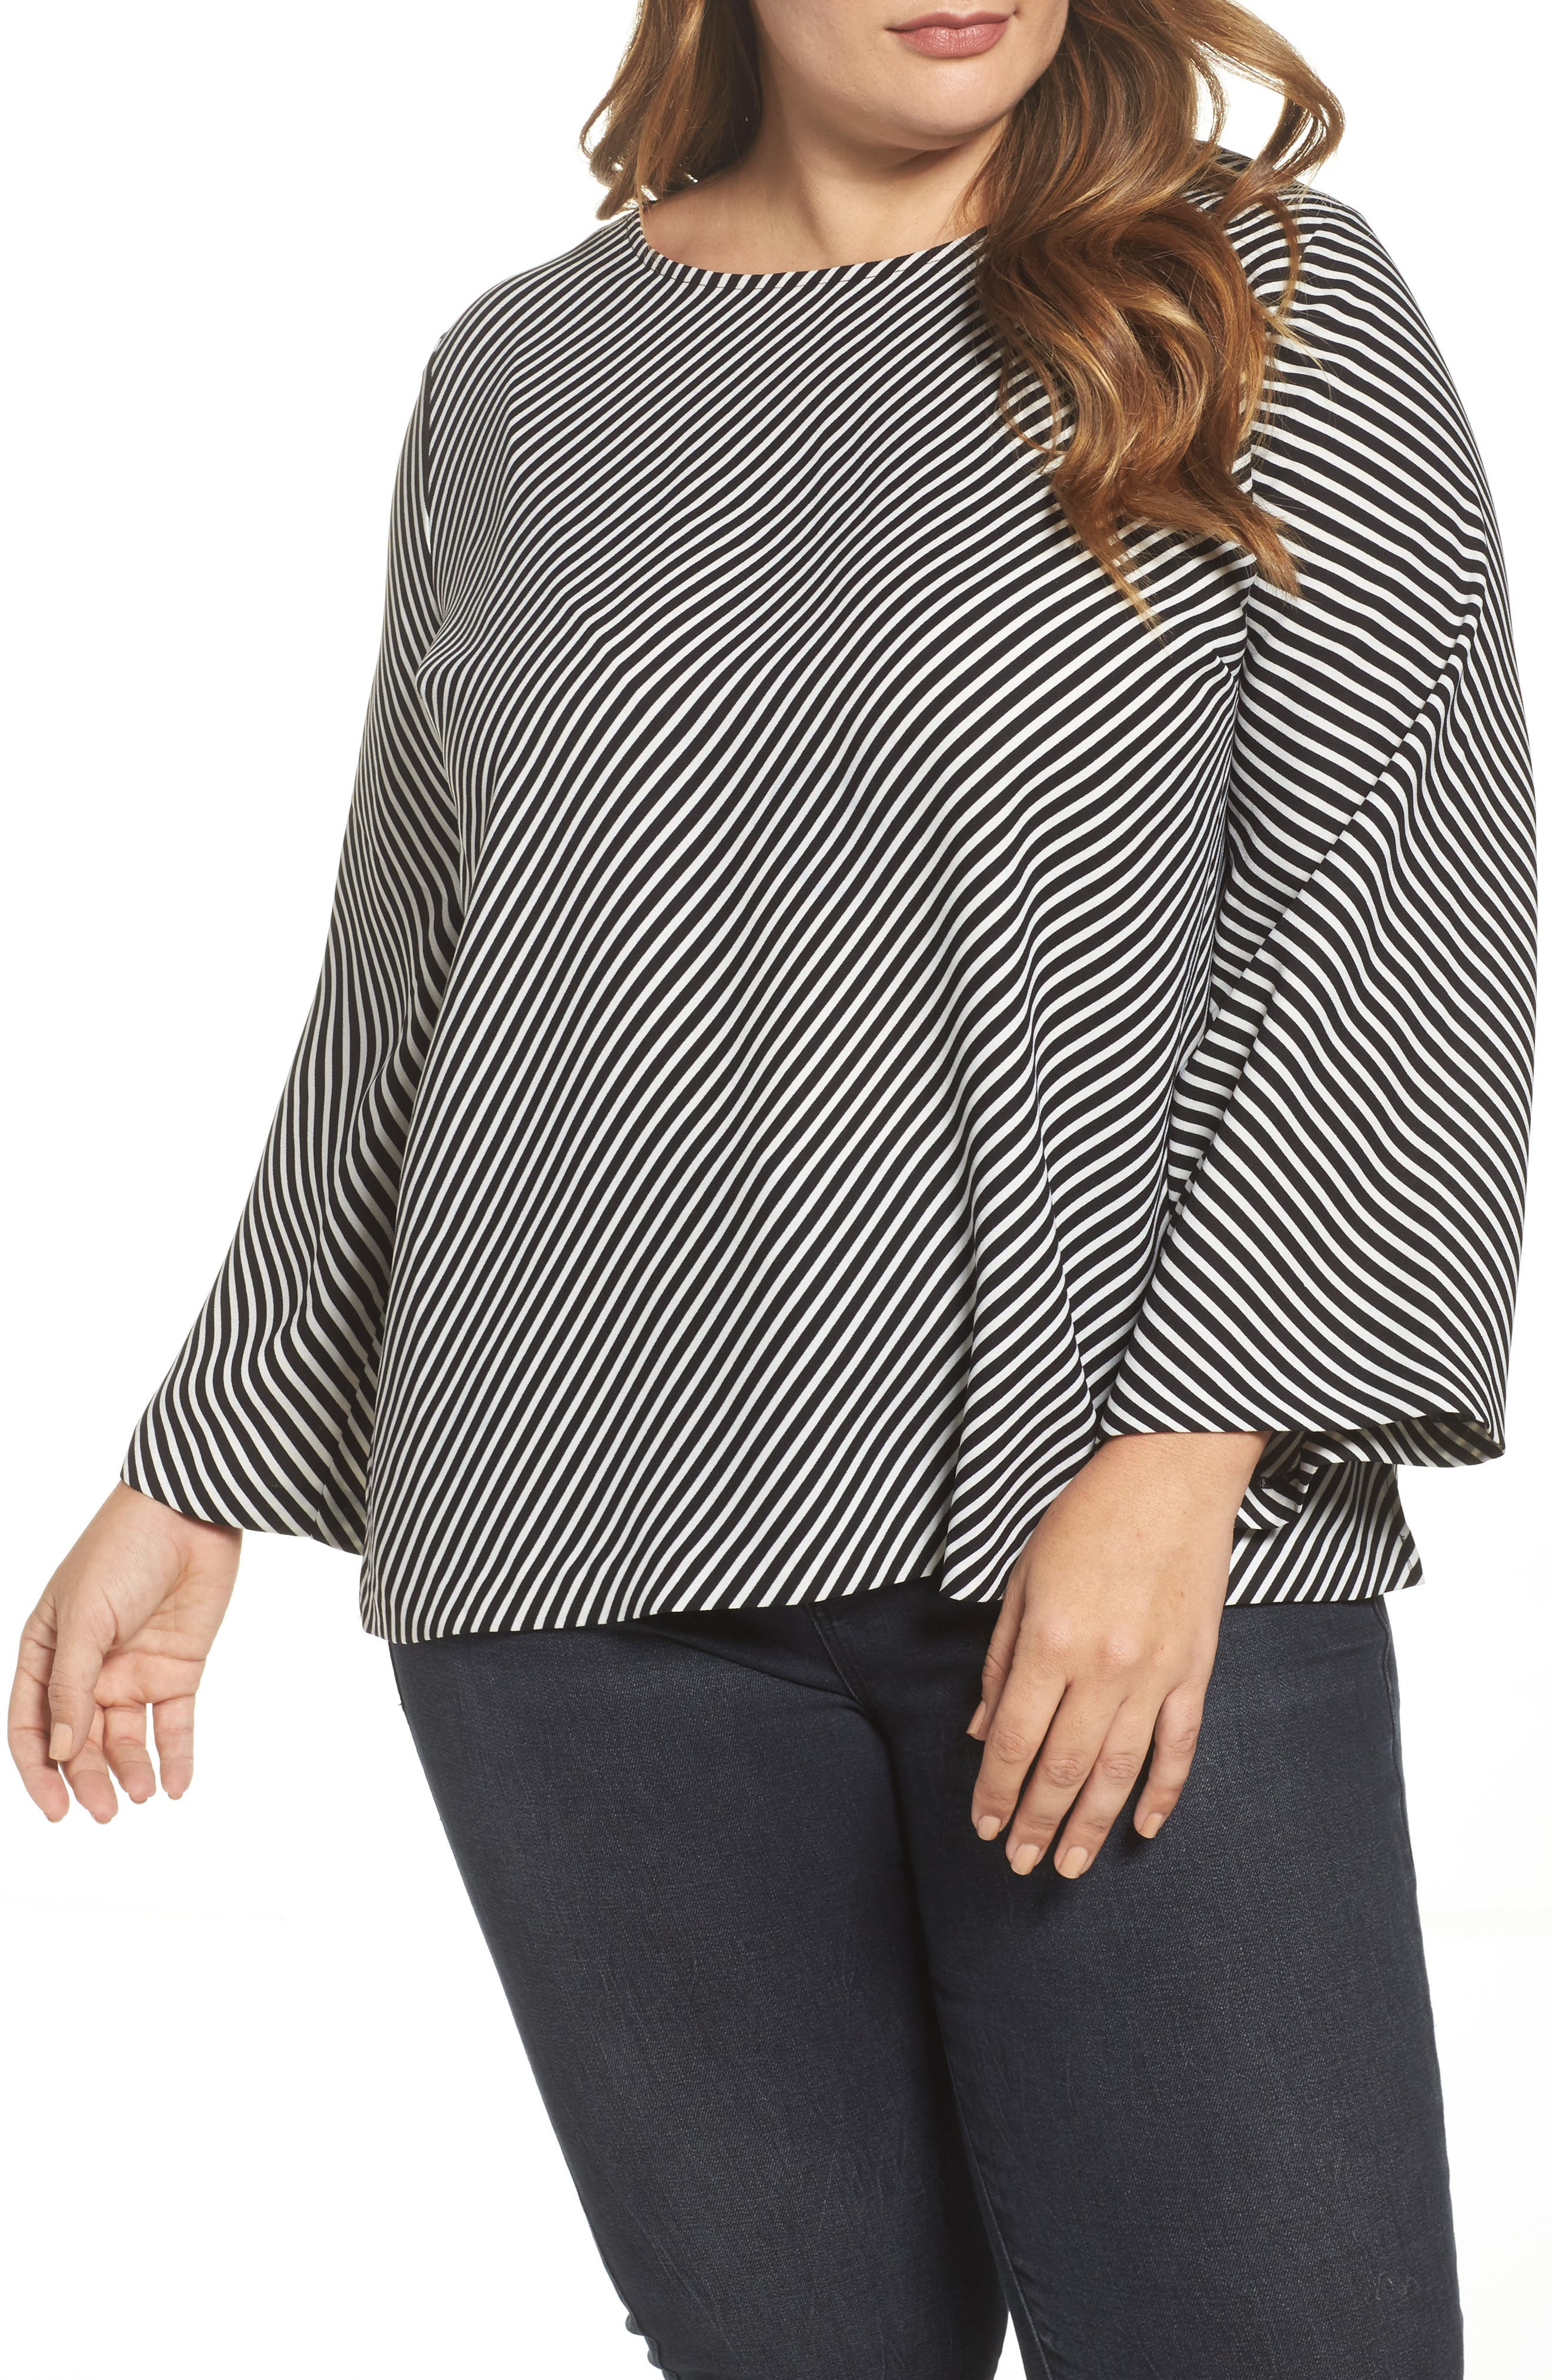 Vince Camuto Bell Sleeve Diagonal Stripe Blouse (Plus Size)